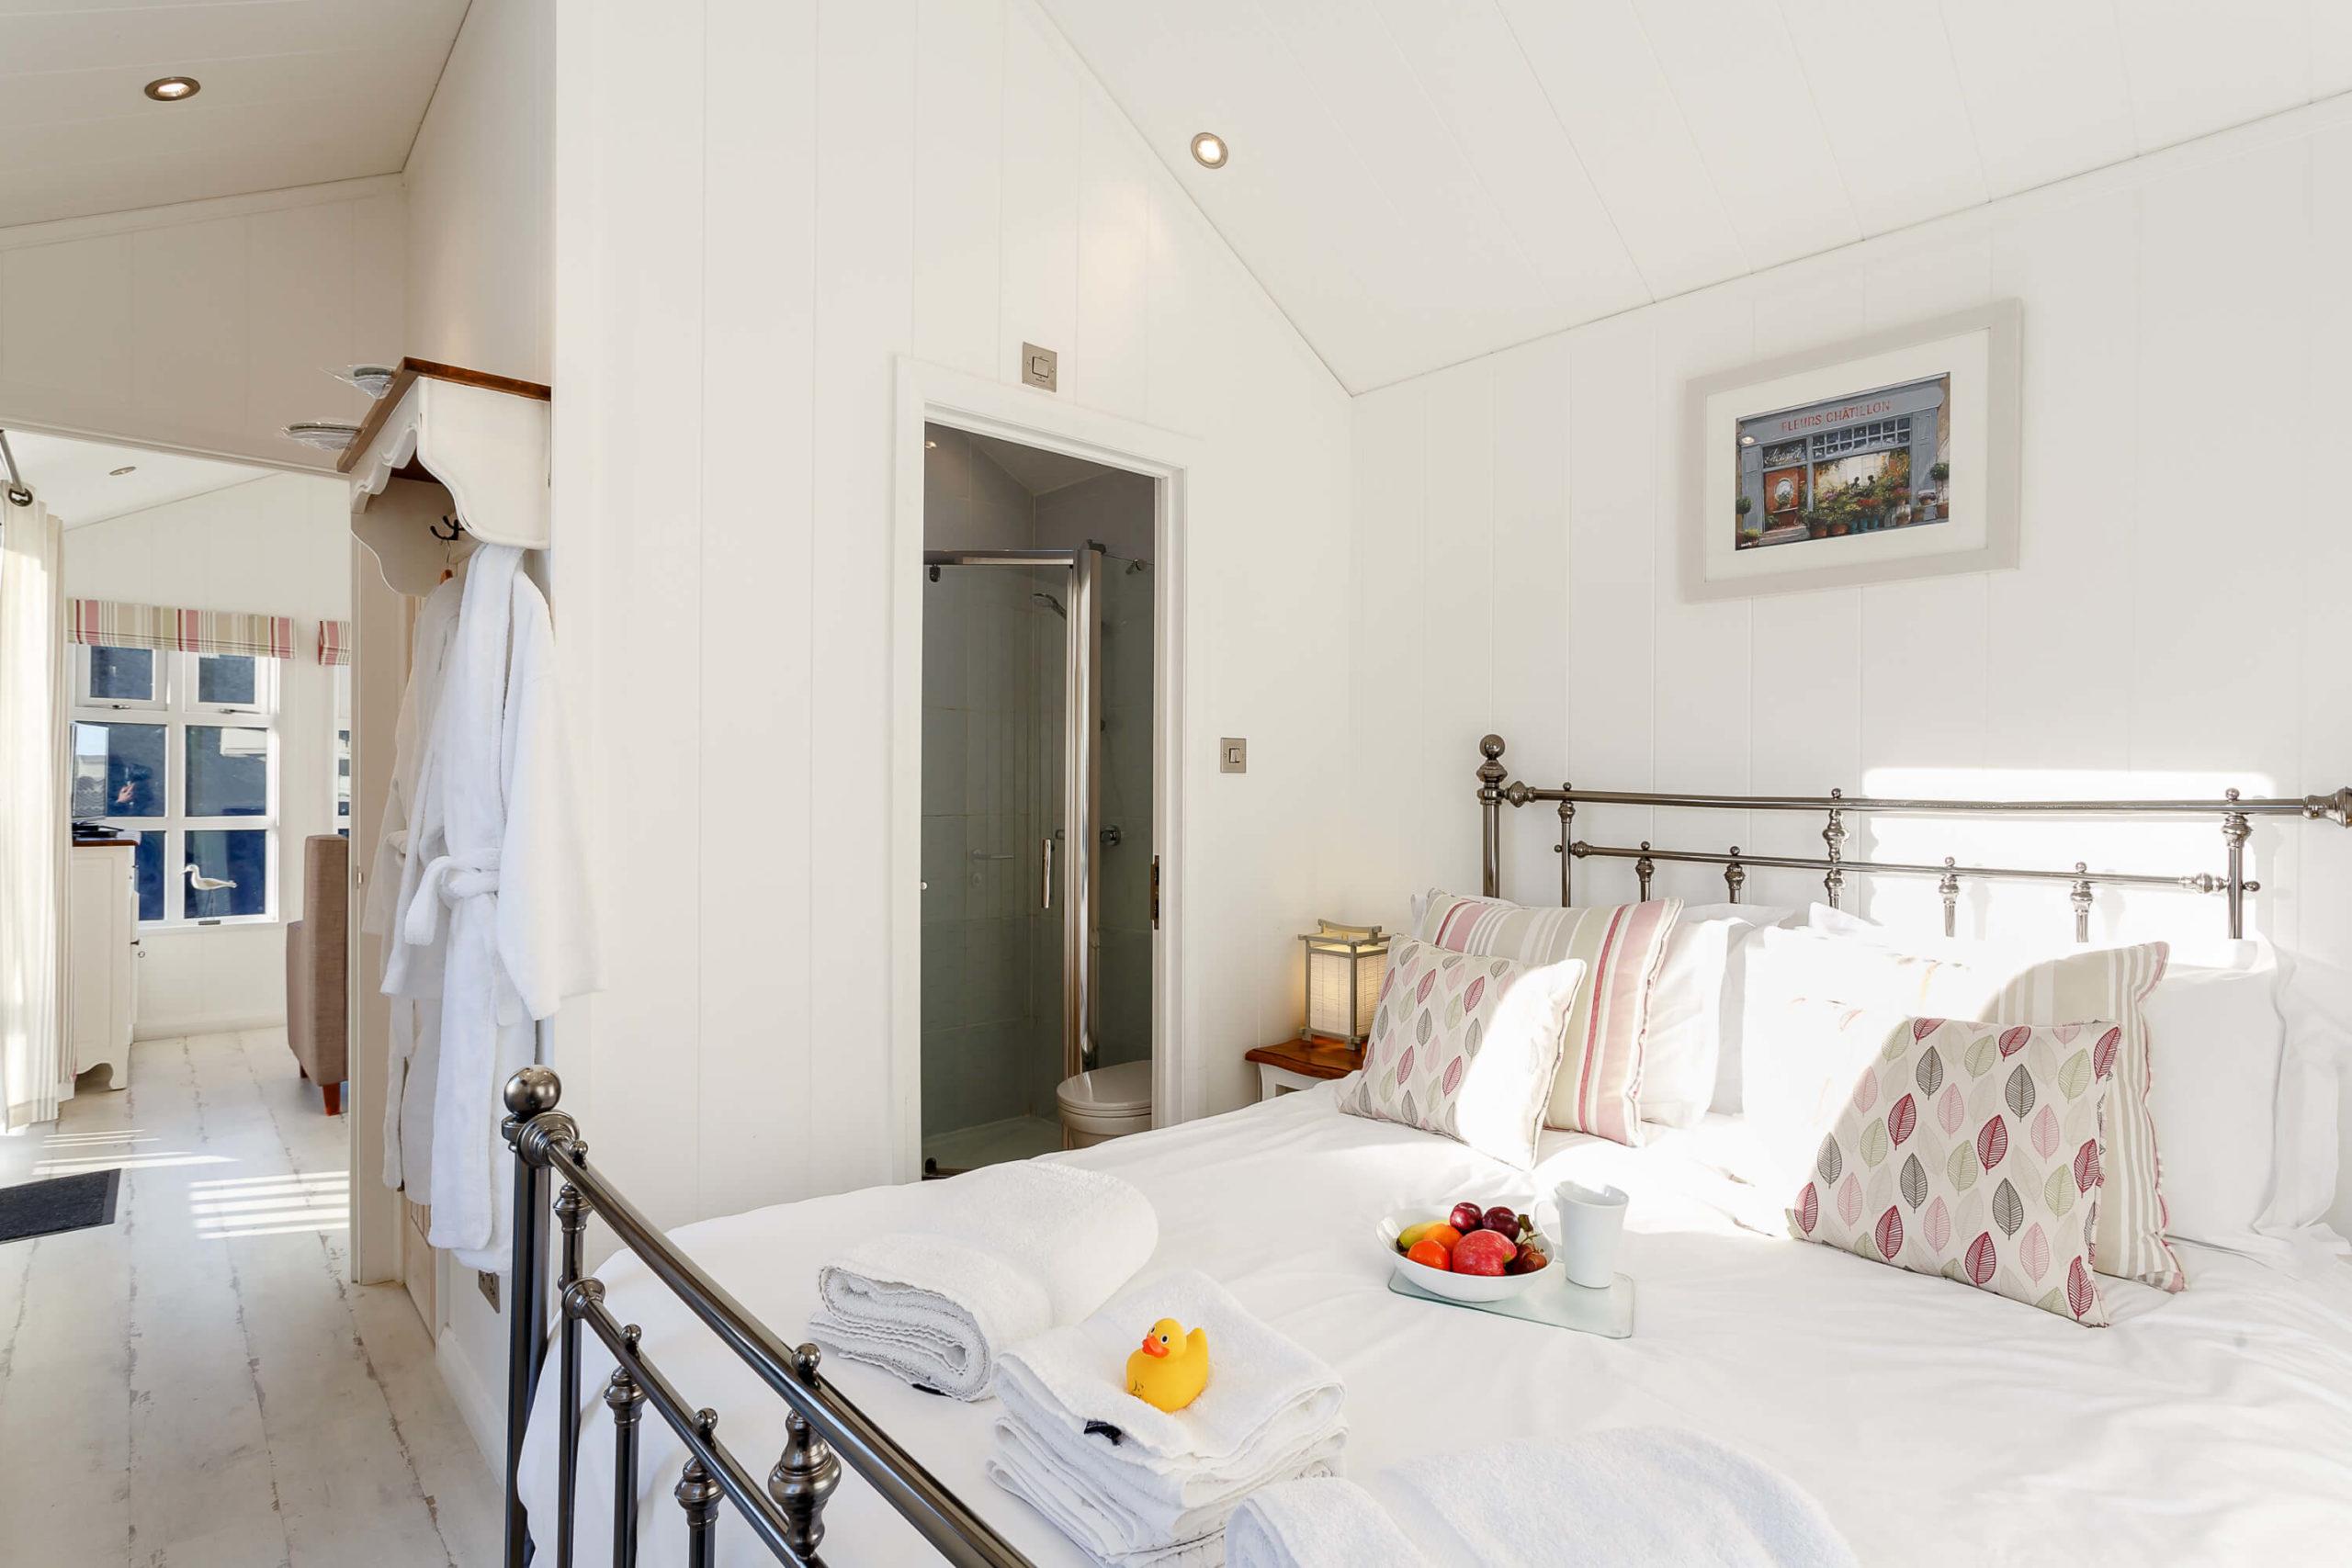 Interior shot of a bedroom at Beach cove